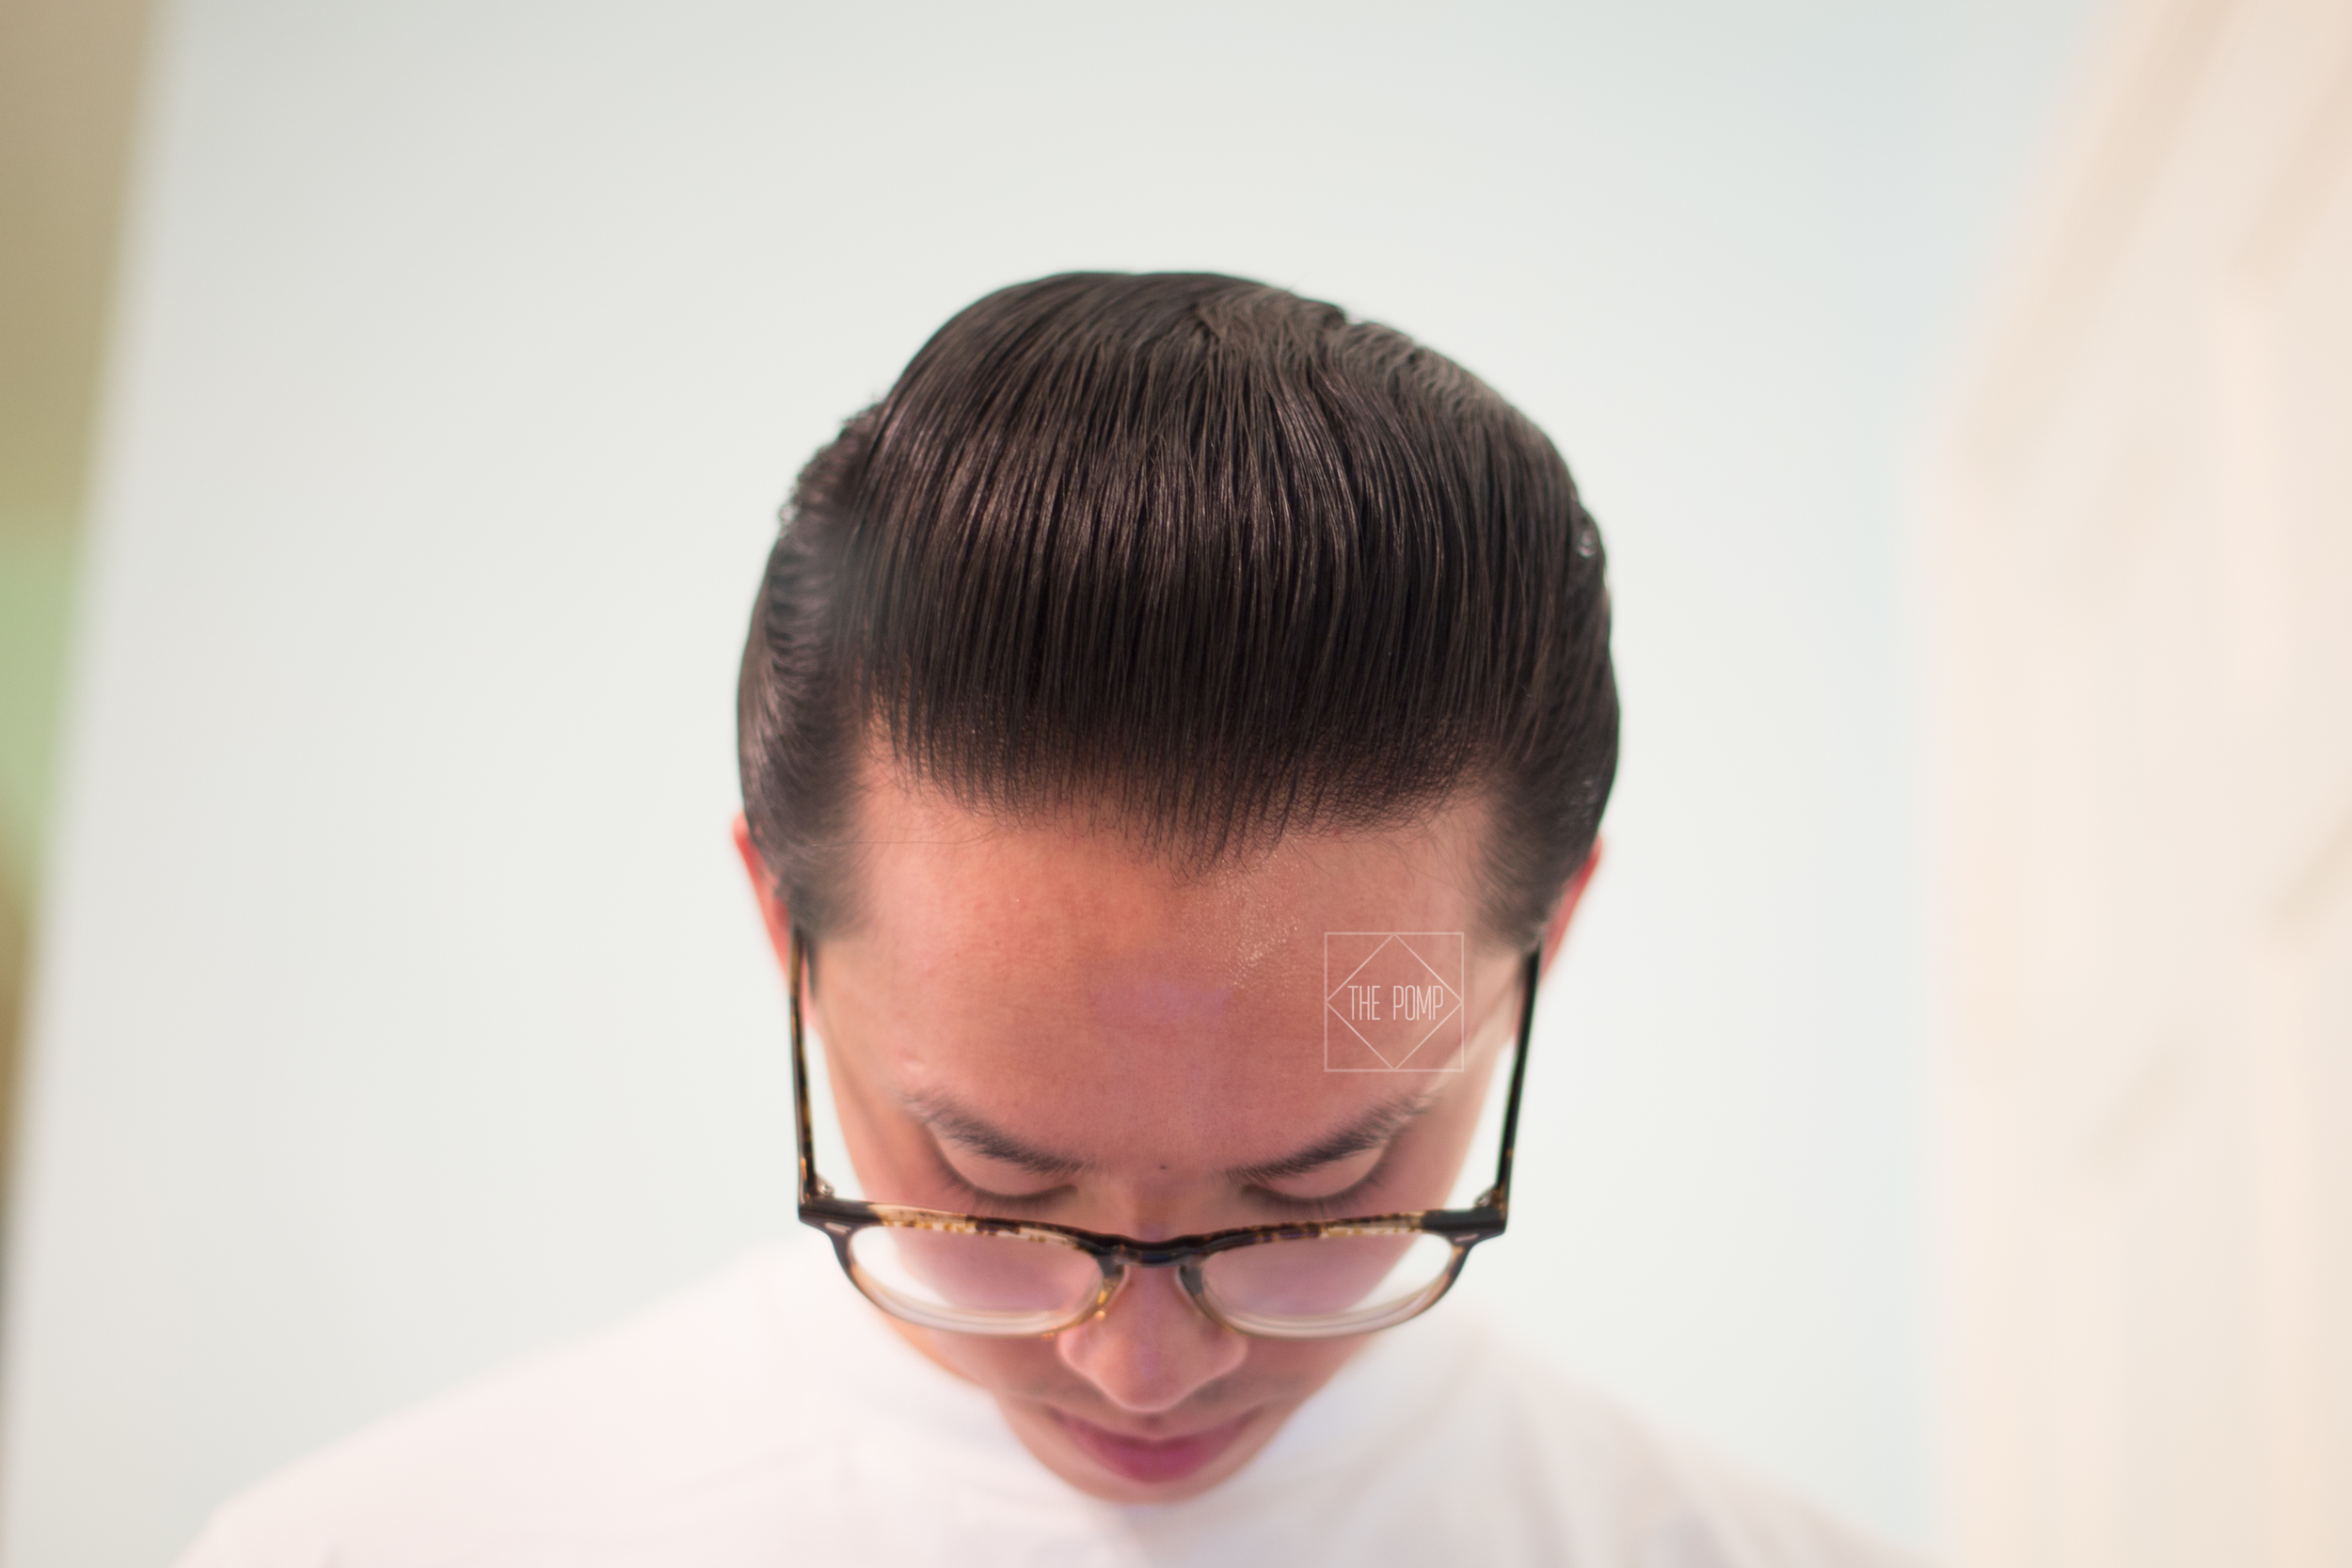 The Daimon Barber Hair Pomade No.2 final slickness